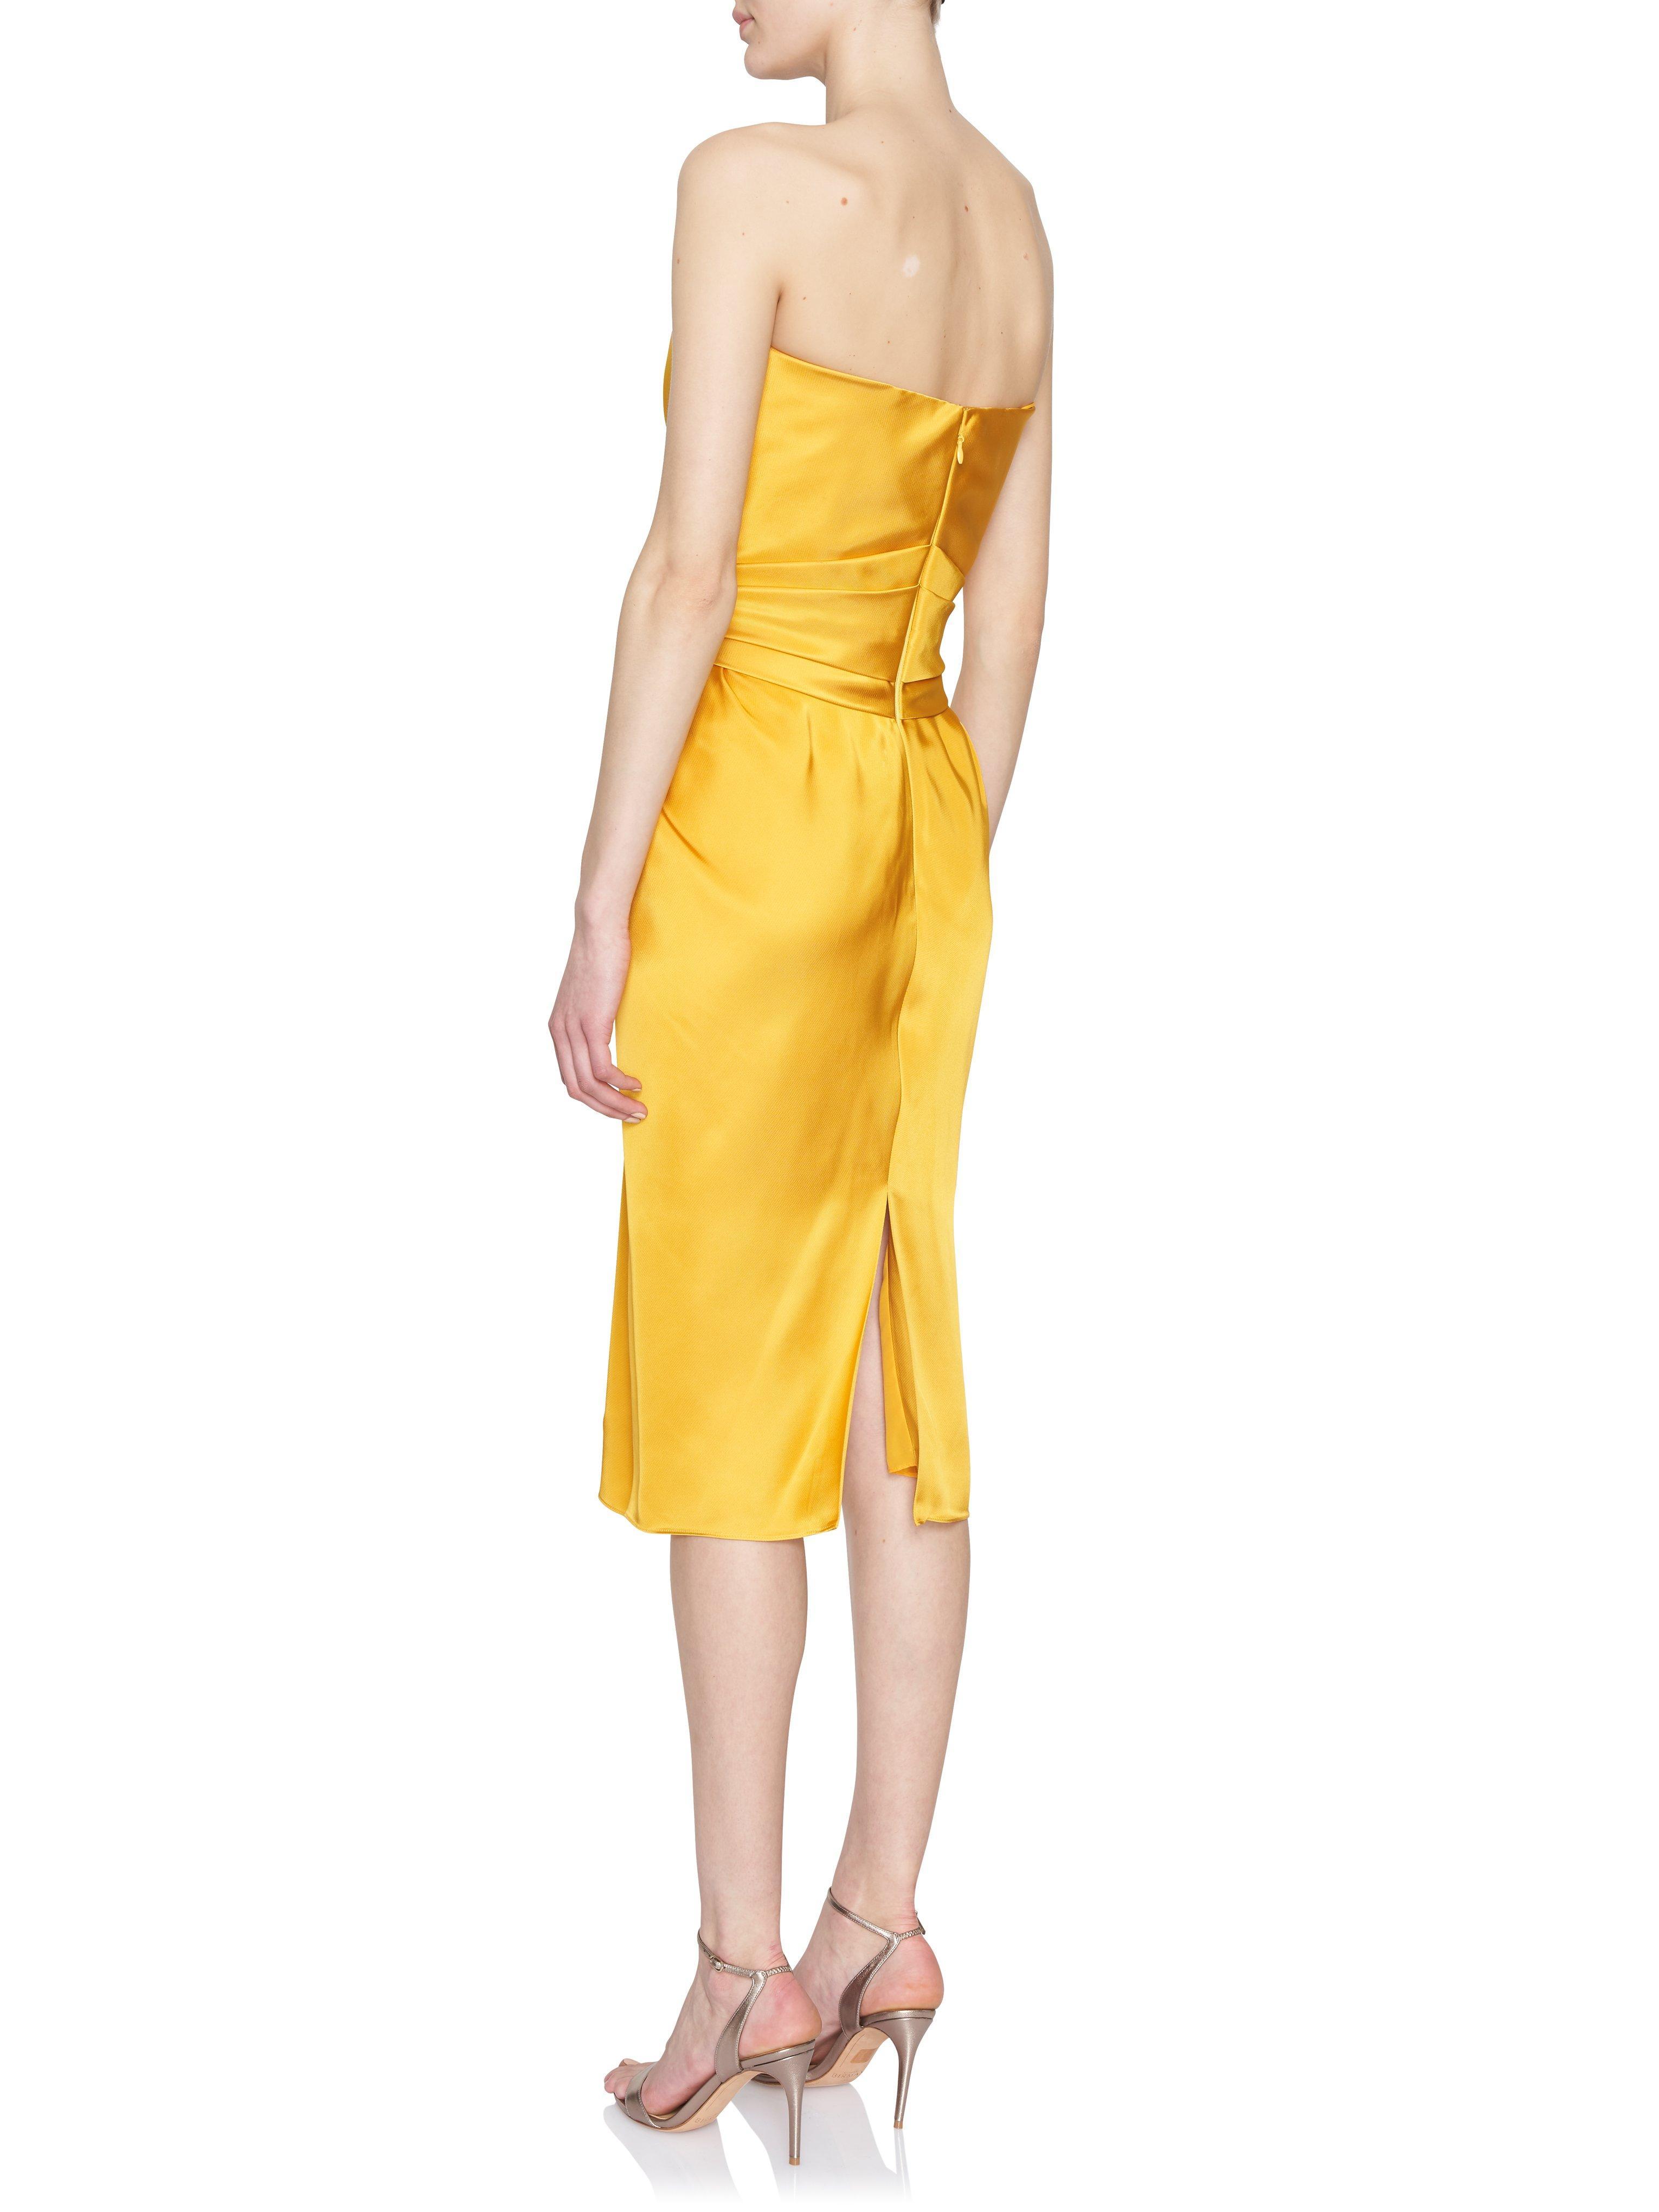 35d5a0ae9bc27 Brandon Maxwell - Yellow Liquid Satin Pleated-front Strapless Dress - Lyst.  View fullscreen